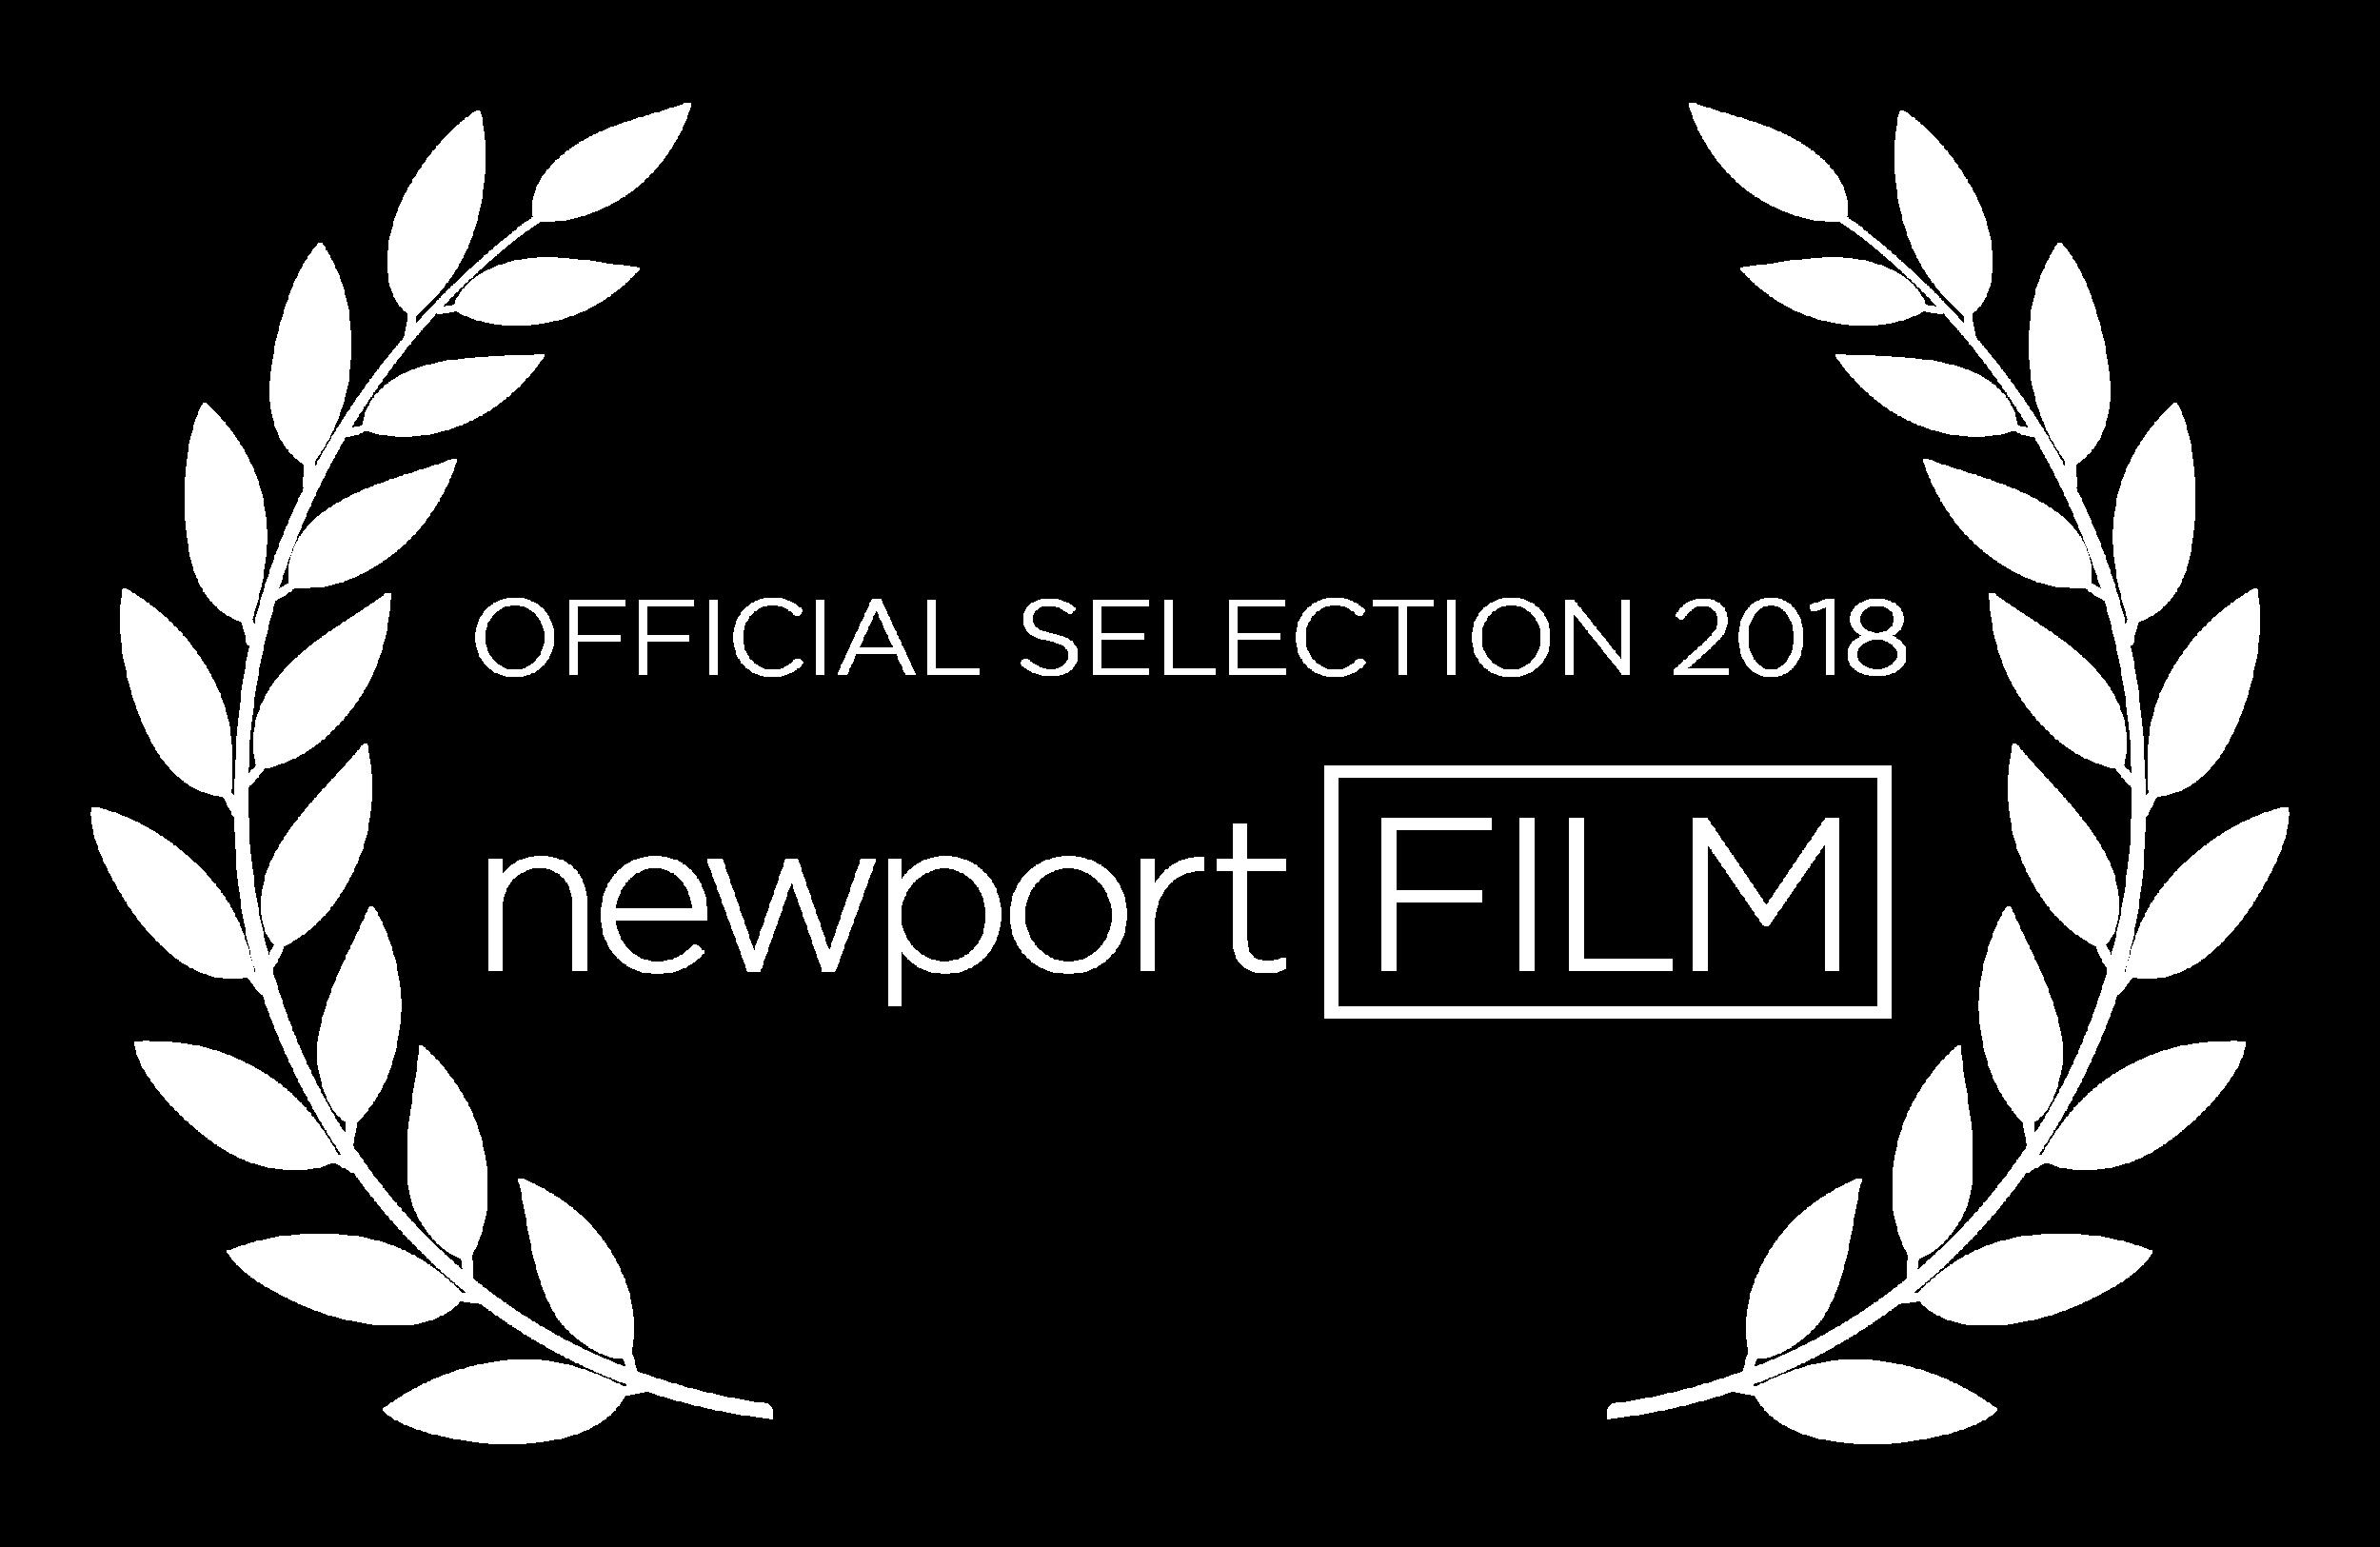 newportfilm_laurel-2018-white.png